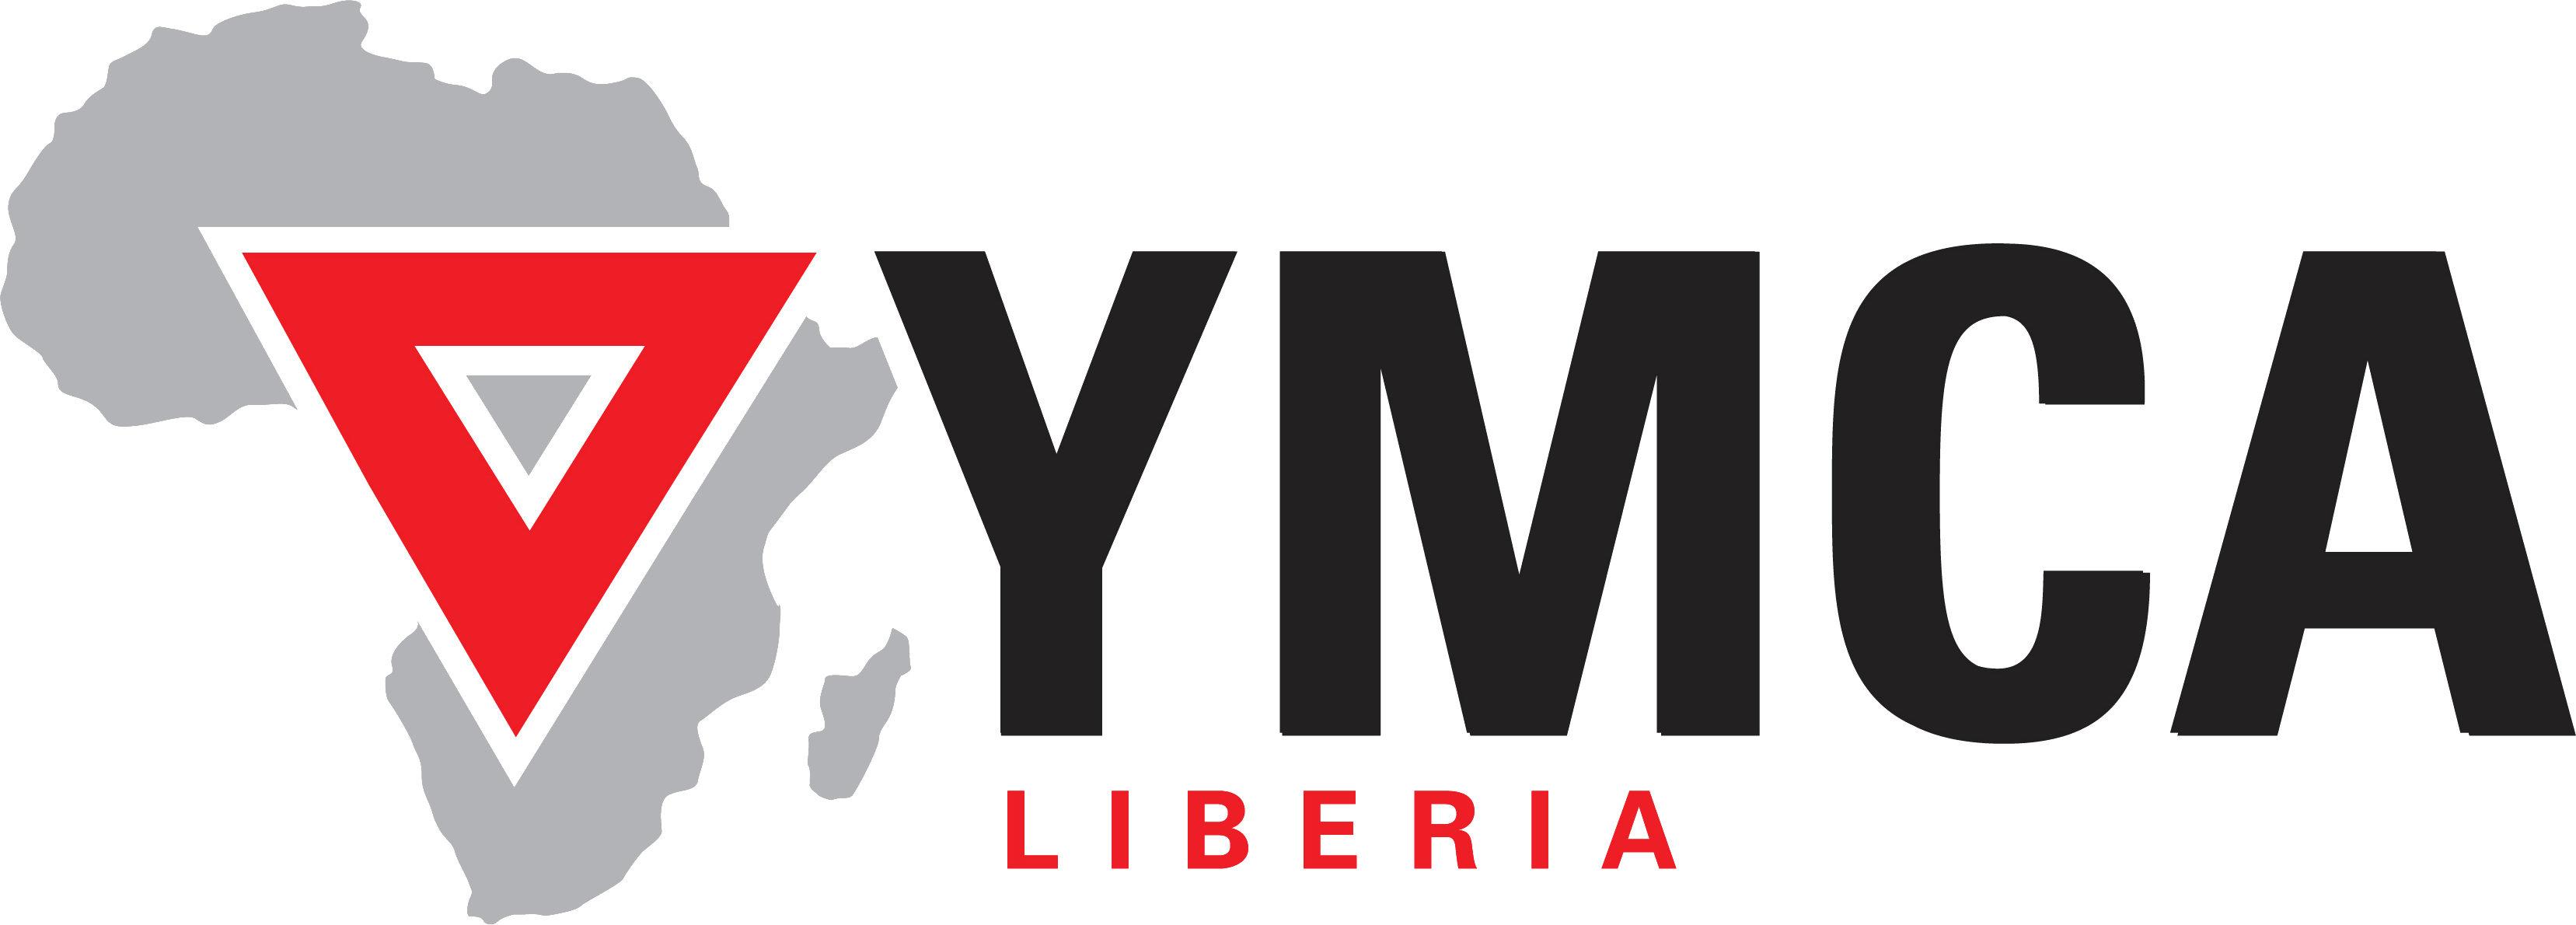 YMCA Liberia